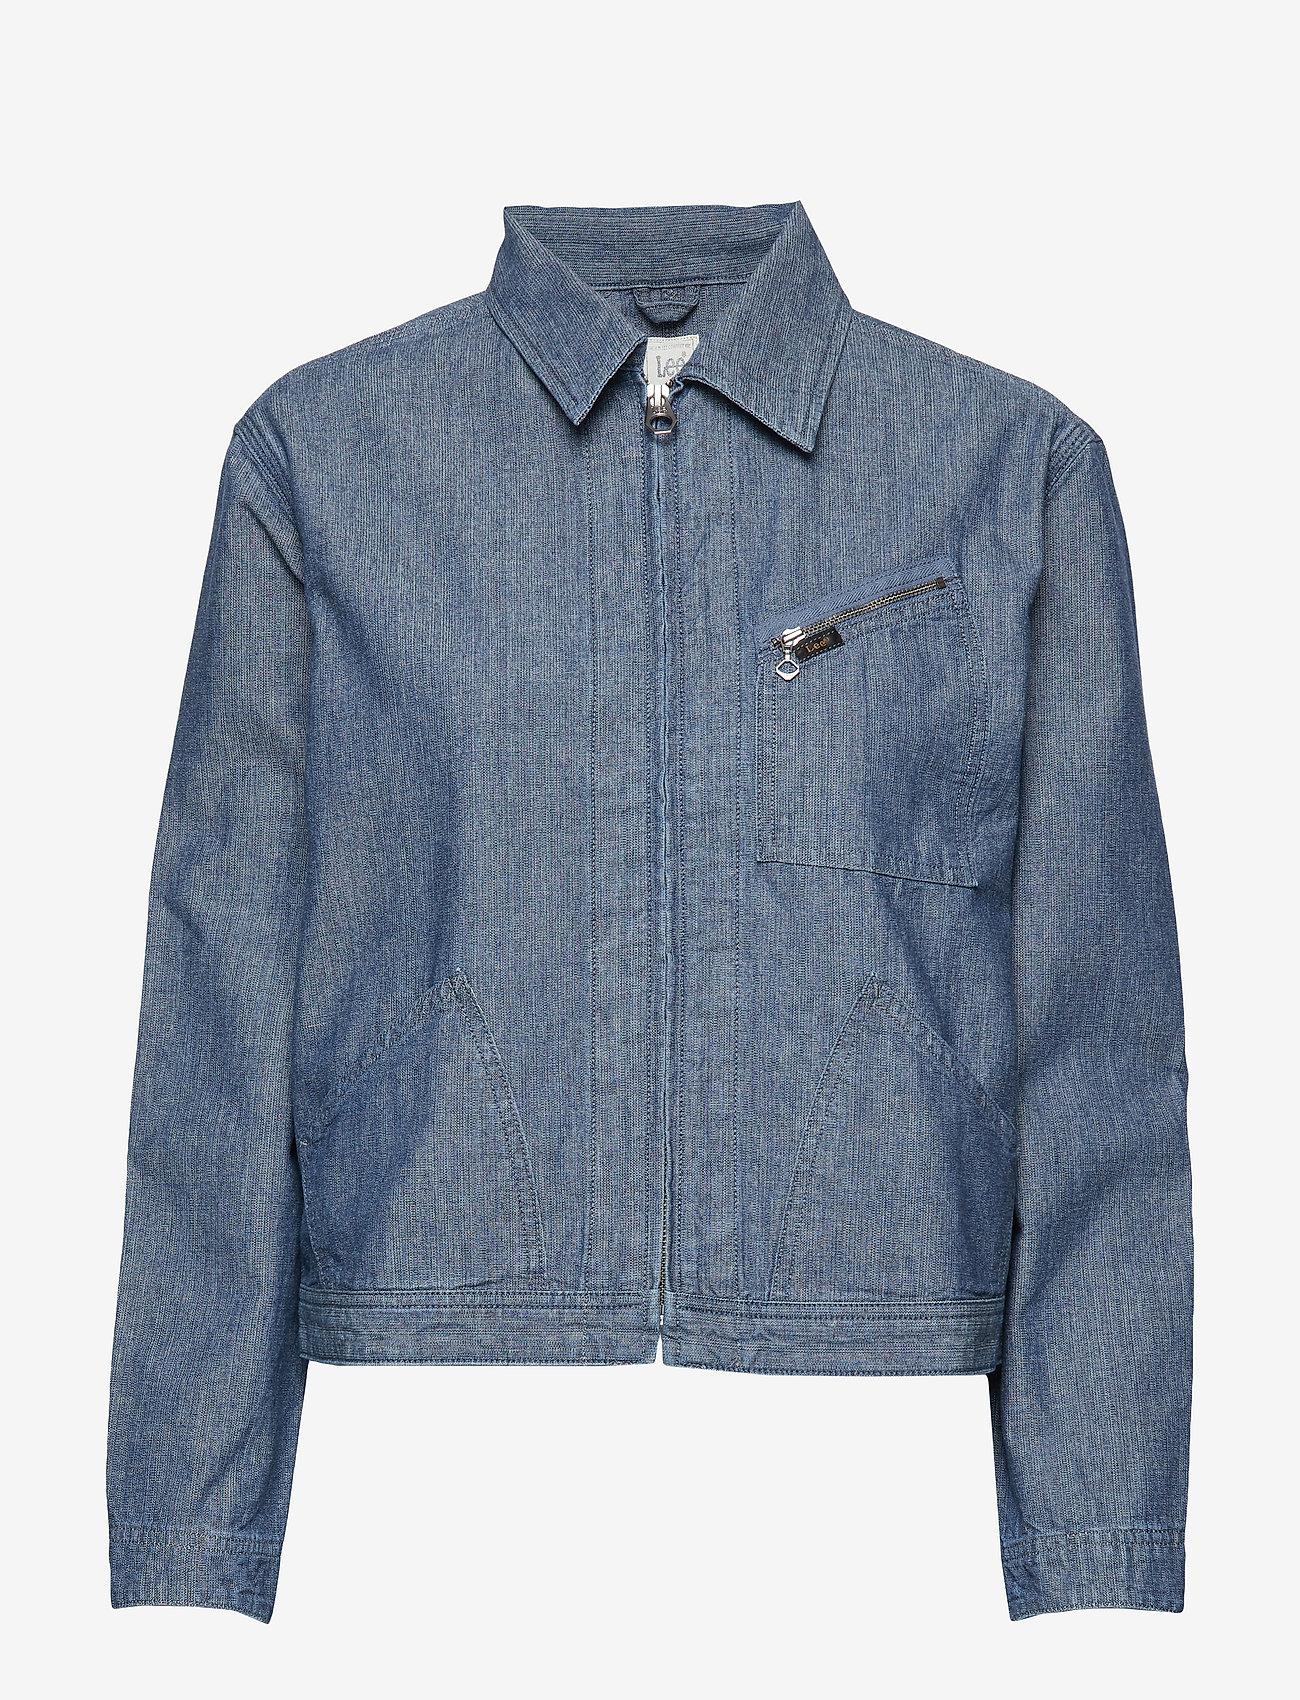 Lee Jeans - 191 J JACKET - jeansjakker - chambray - 0